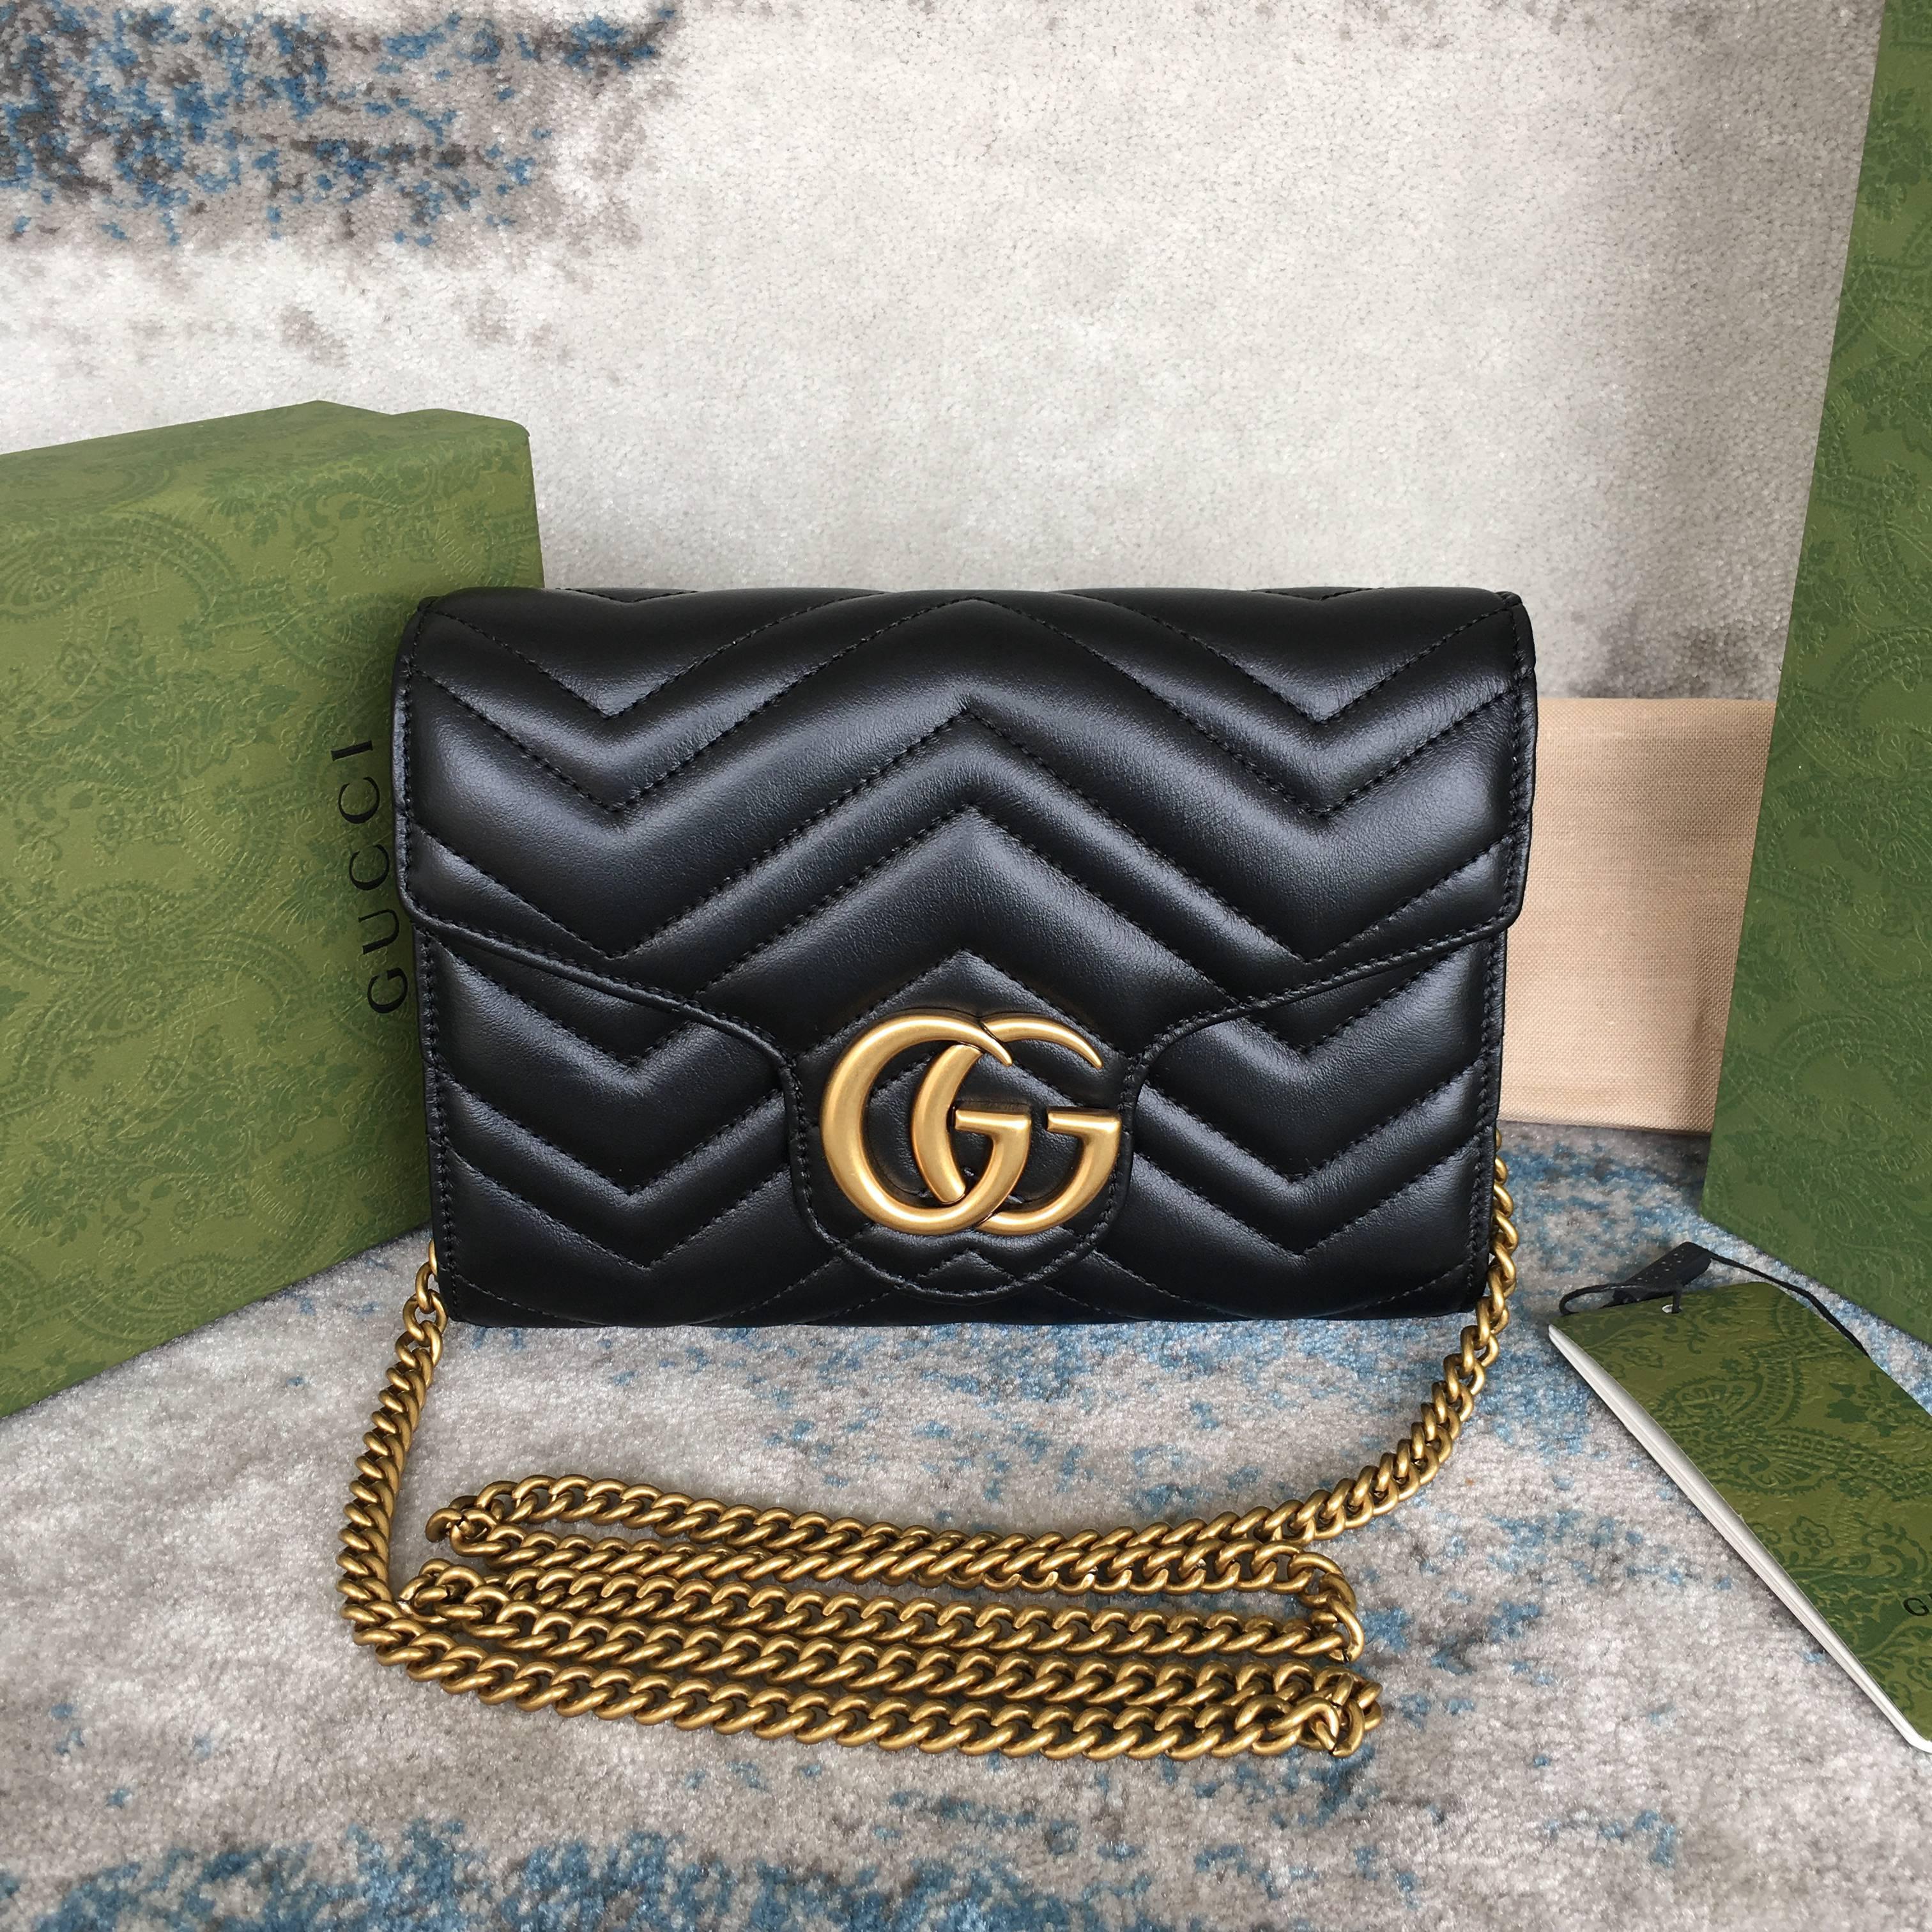 Gucci Marmont matelassé mini bag 474575